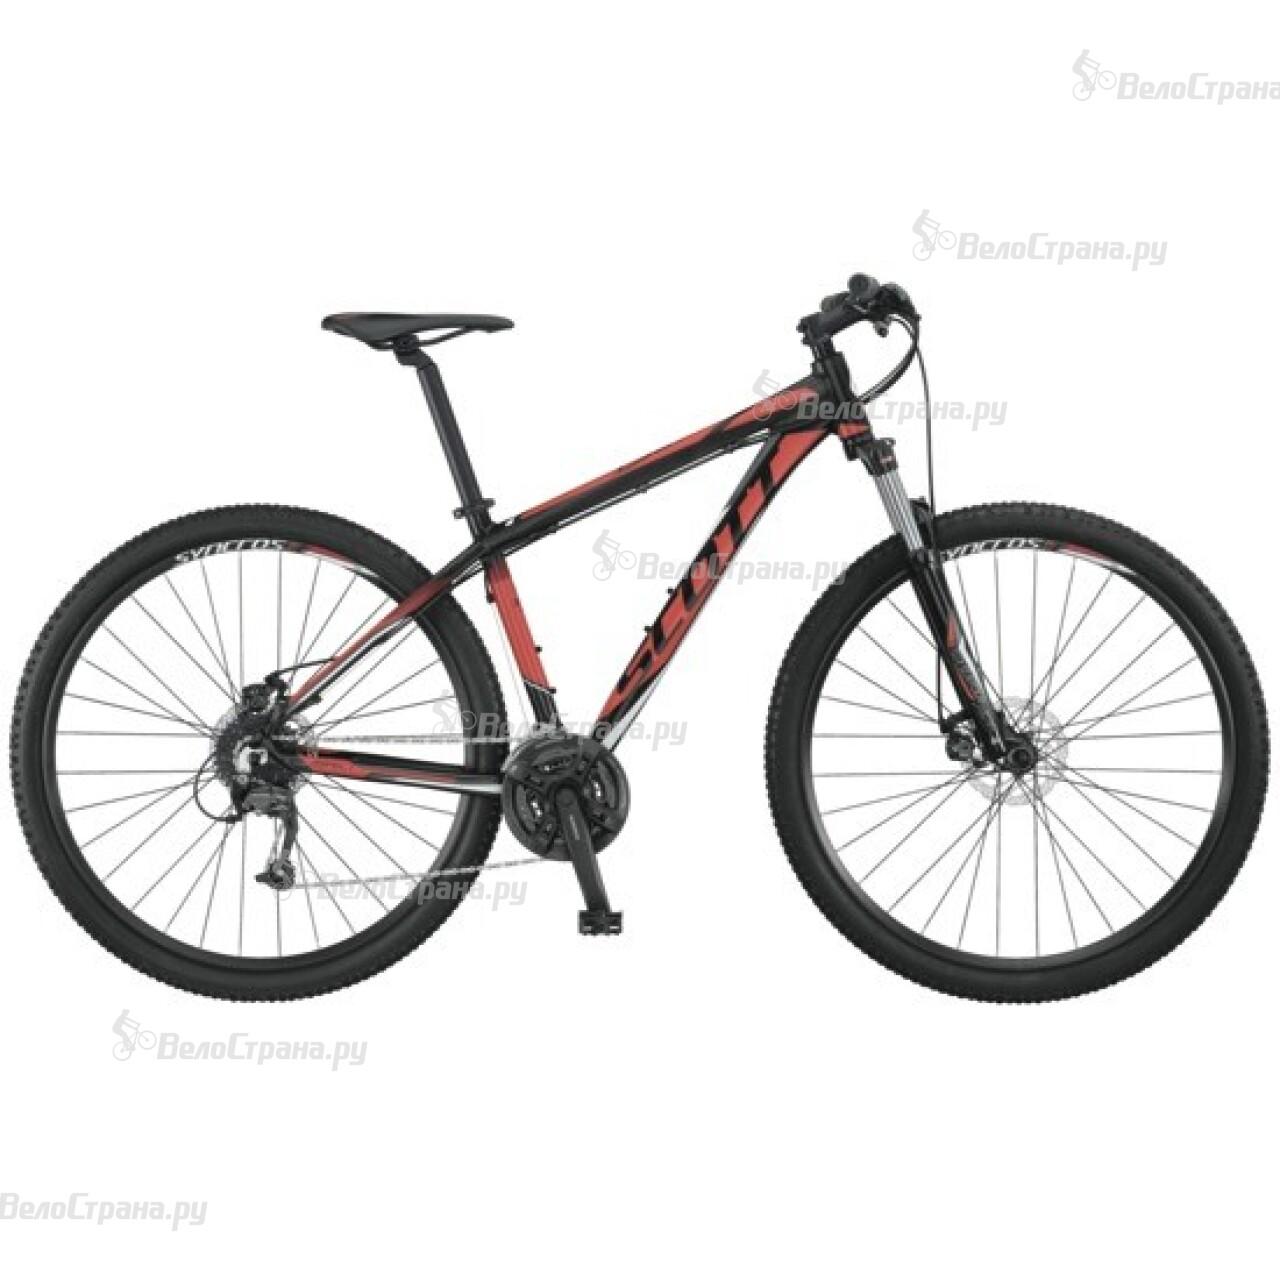 Велосипед Scott Aspect 950 (2014) велосипед scott aspect 950 29 2016